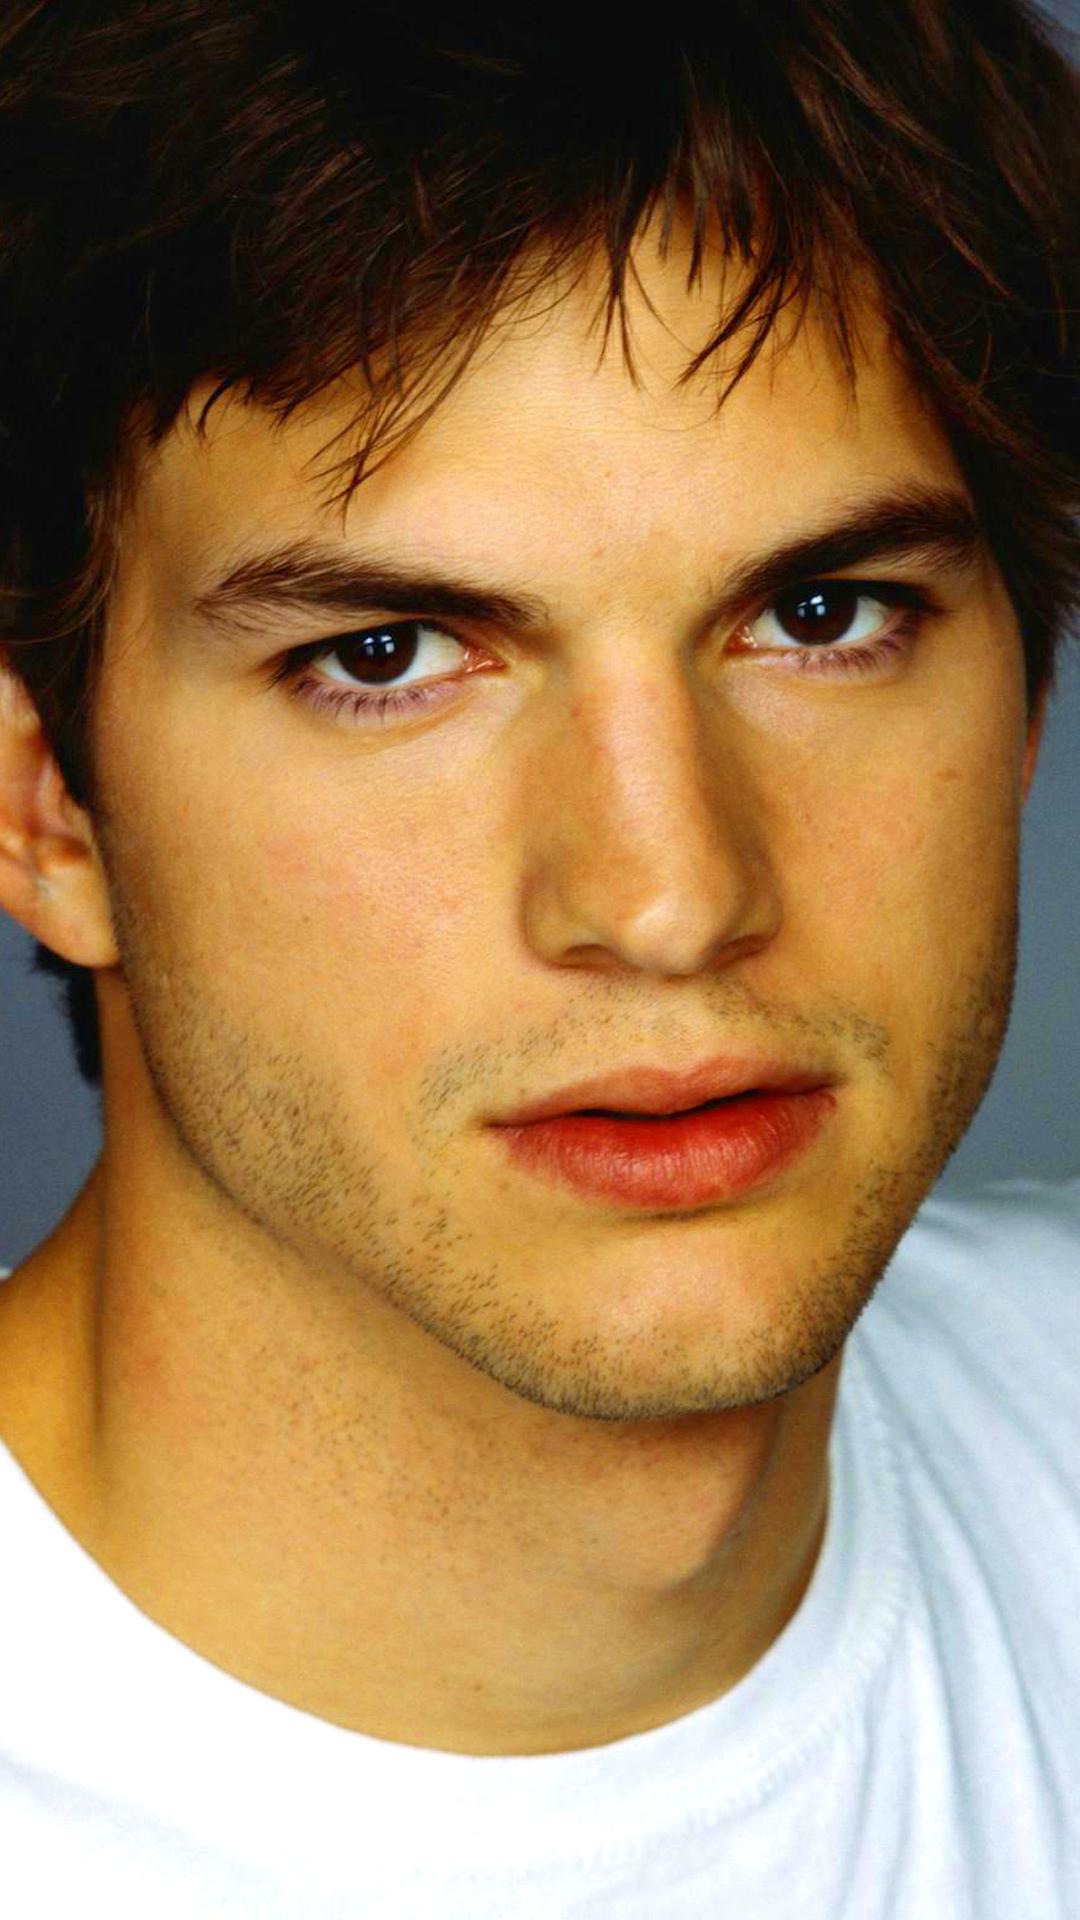 CelebrityAshton Kutcher 1080x1920 Wallpaper ID 642489   Mobile 1080x1920